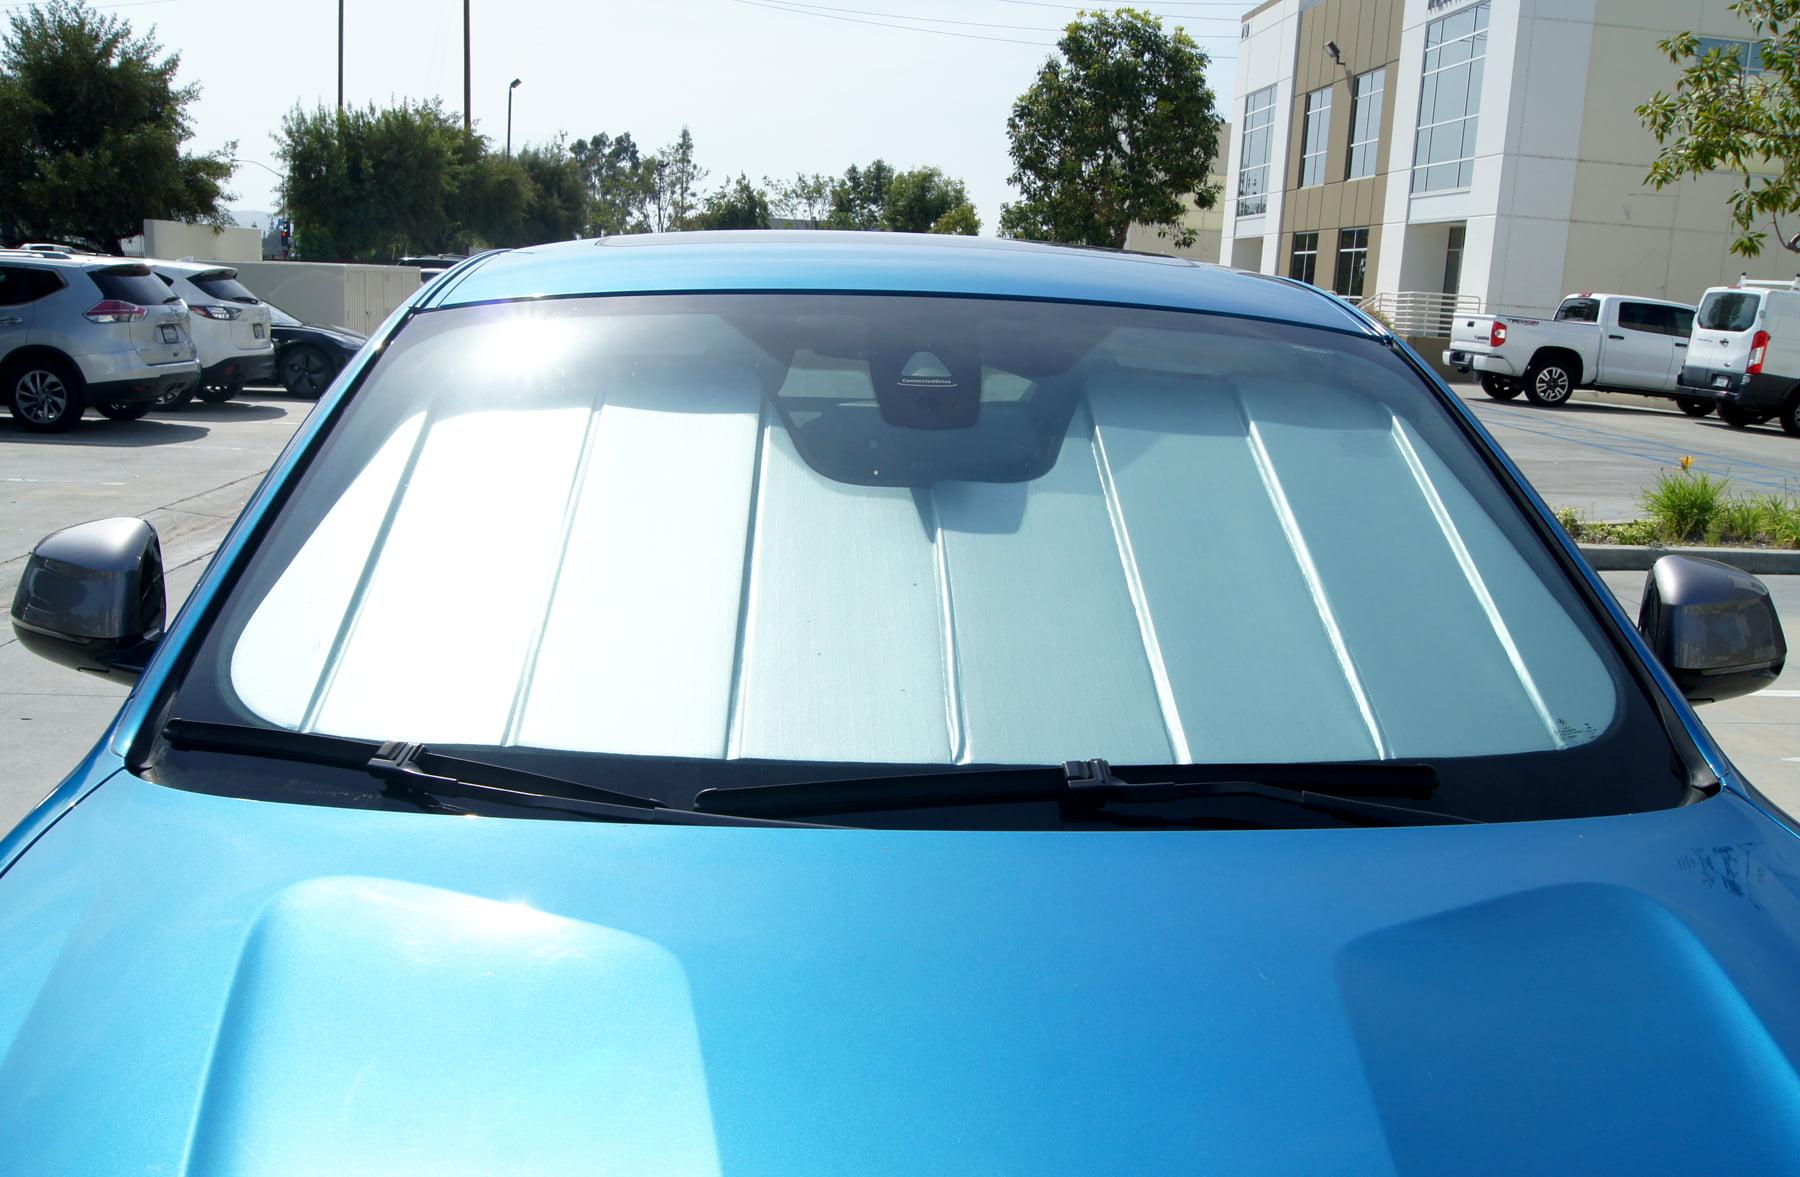 Sunshade Visor Silver /& Grey 1-pc Set Compatible With 2016-2019 Honda Civic Sedan 4 Door Tuningpros SS-132-2 Custom Fit Car Windshield Sun Shade Protector